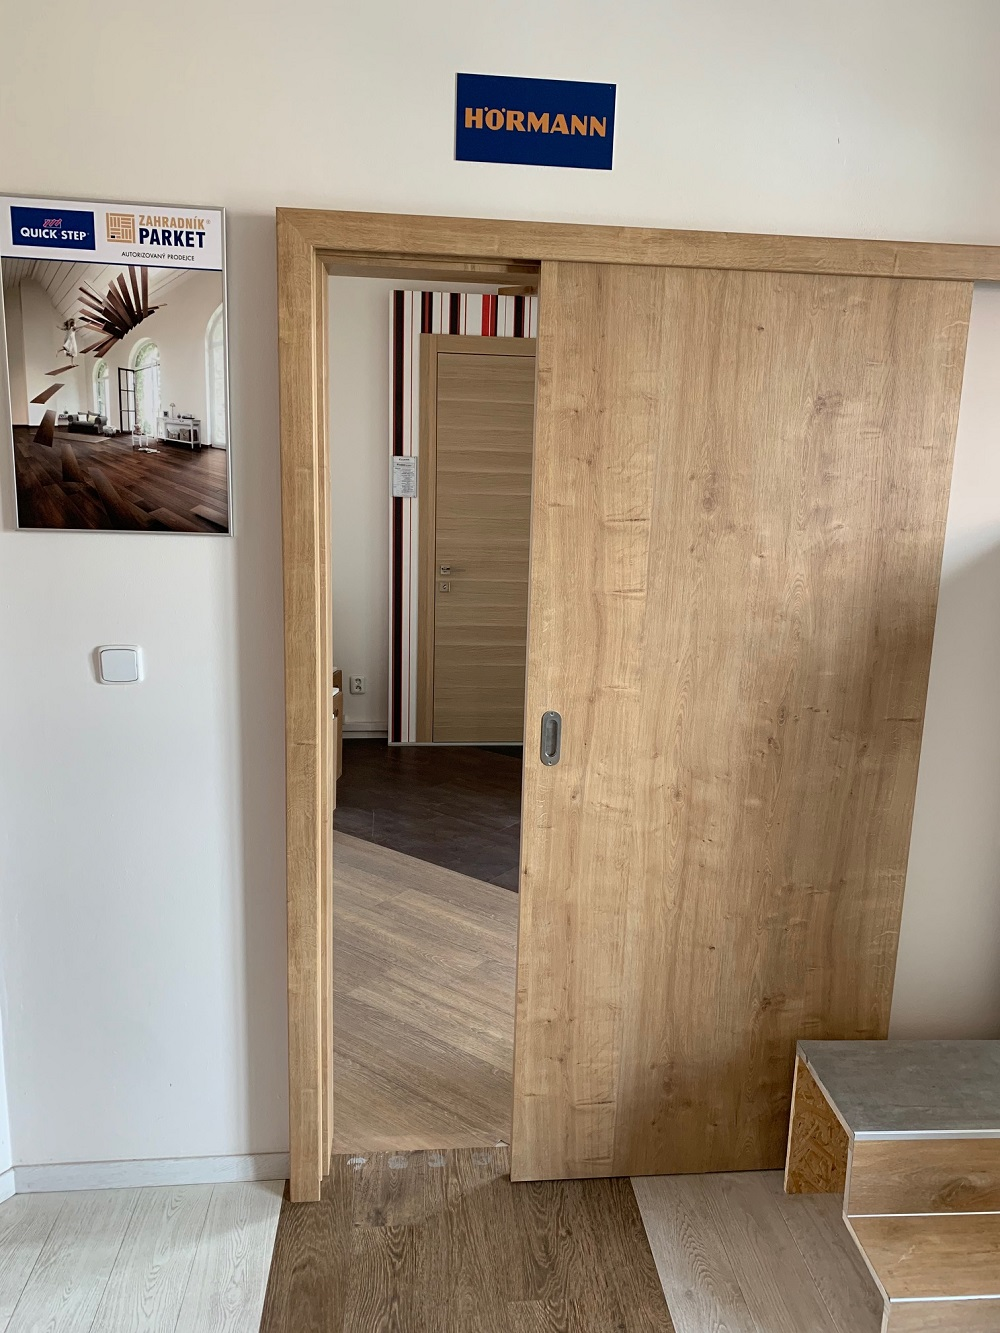 Dveře Hormann Praha 6